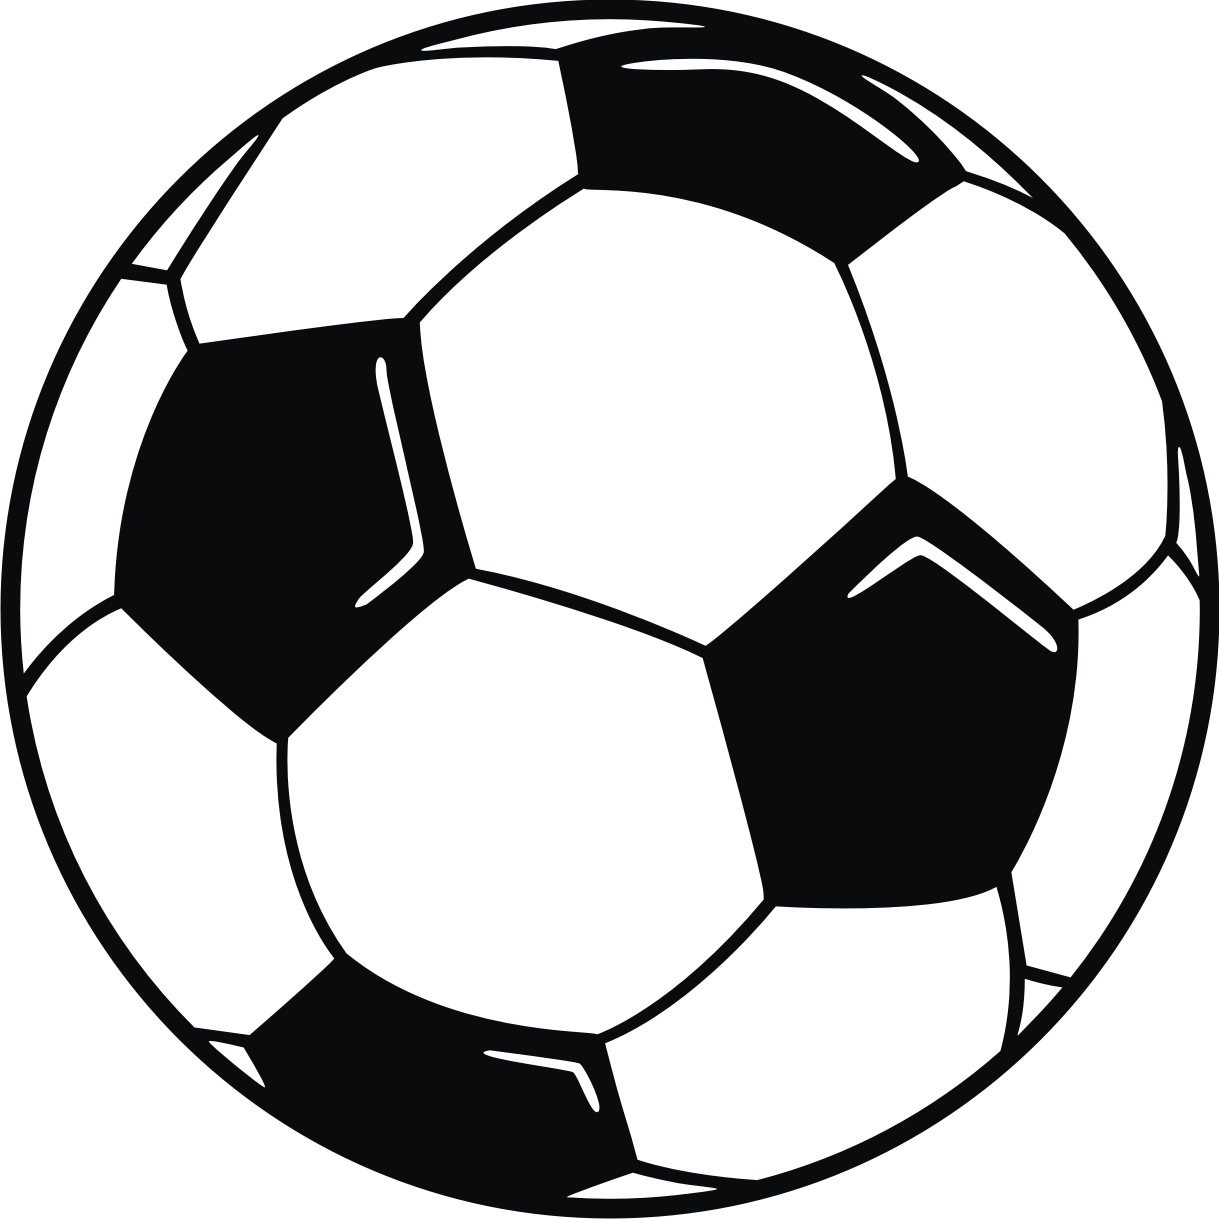 1219x1219 Soccer Ball Clipart Many Interesting Cliparts